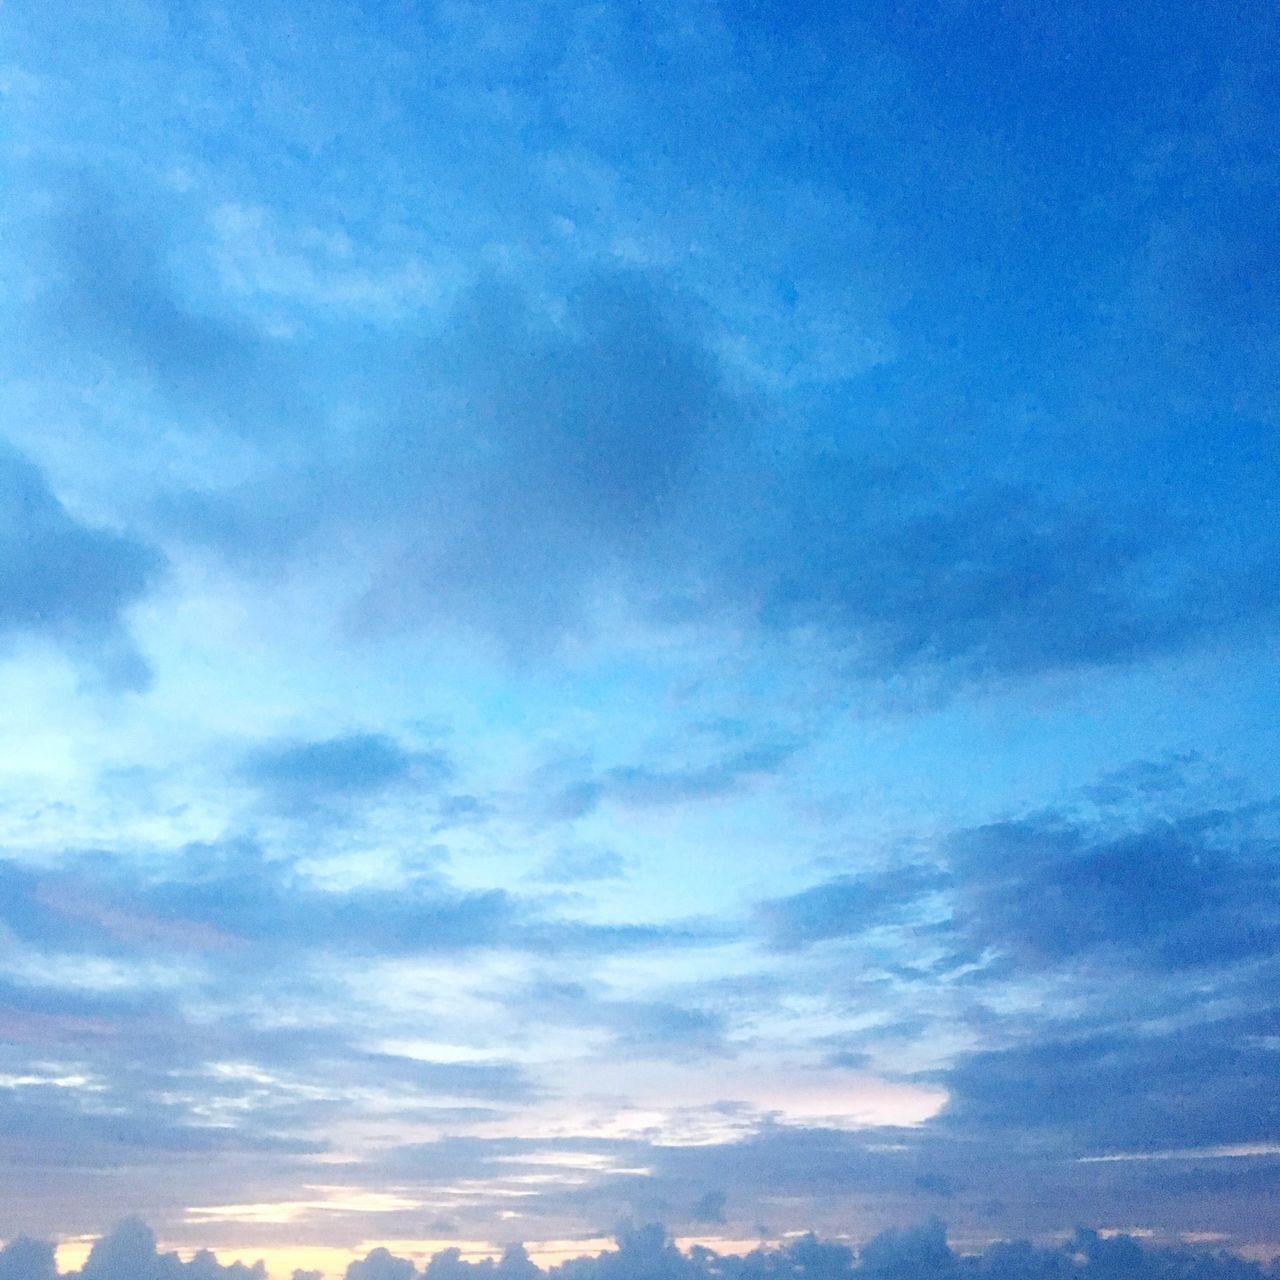 I don't know how to live. Sky Blue Magic Hour